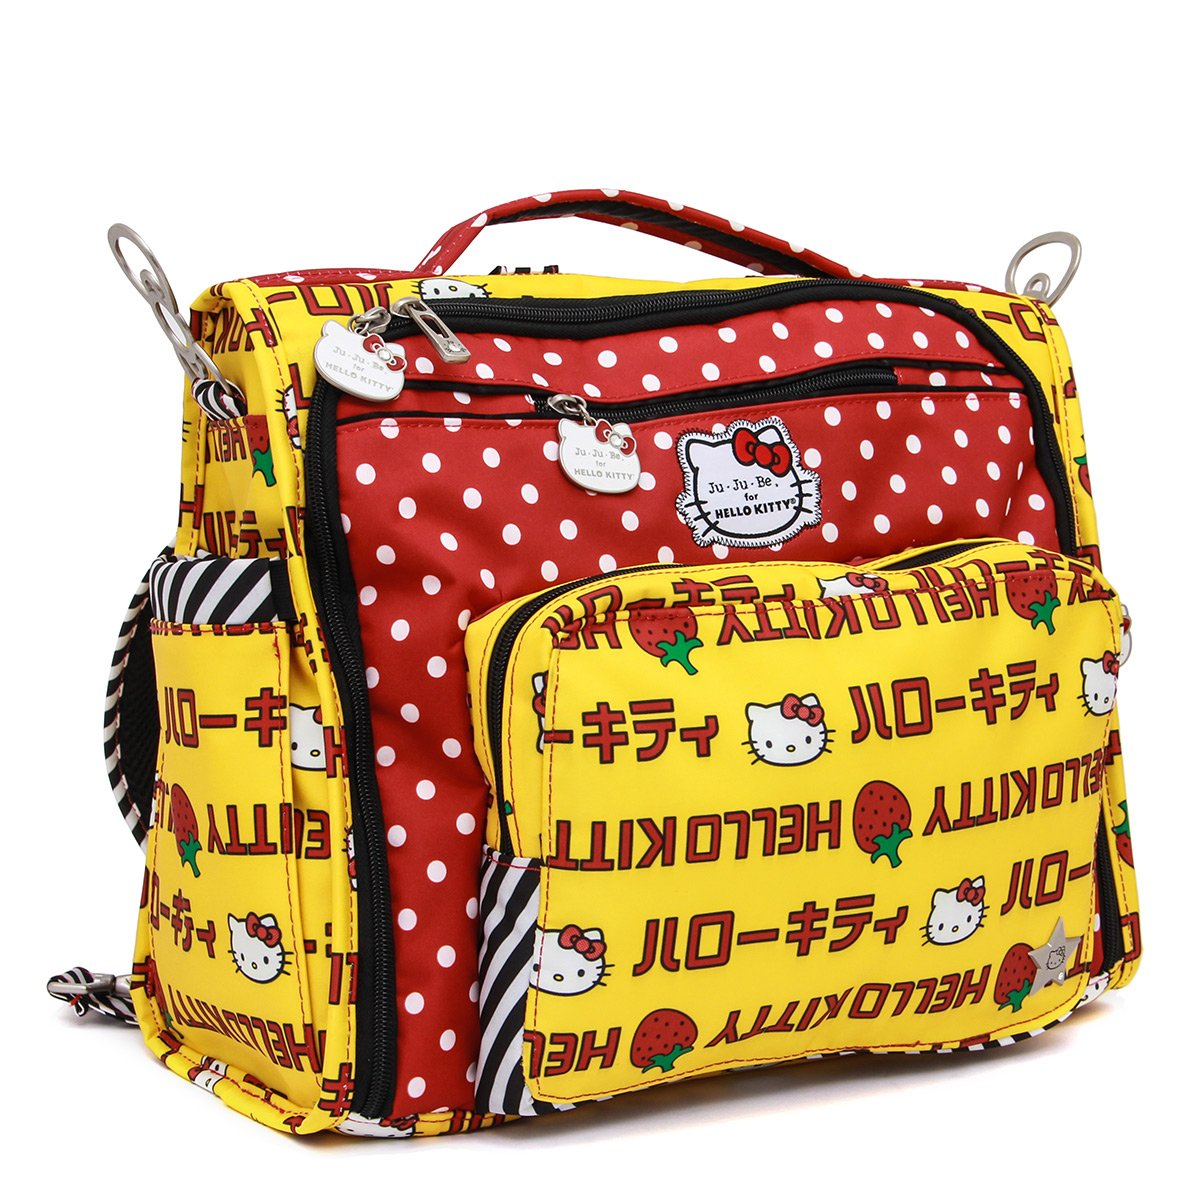 9fa7ef5b2465 Ju-Ju-Be - Hello Kitty Collection - B.F.F. - Convertible Nappy Changing Bag  - Rucksack   Messenger  Tote